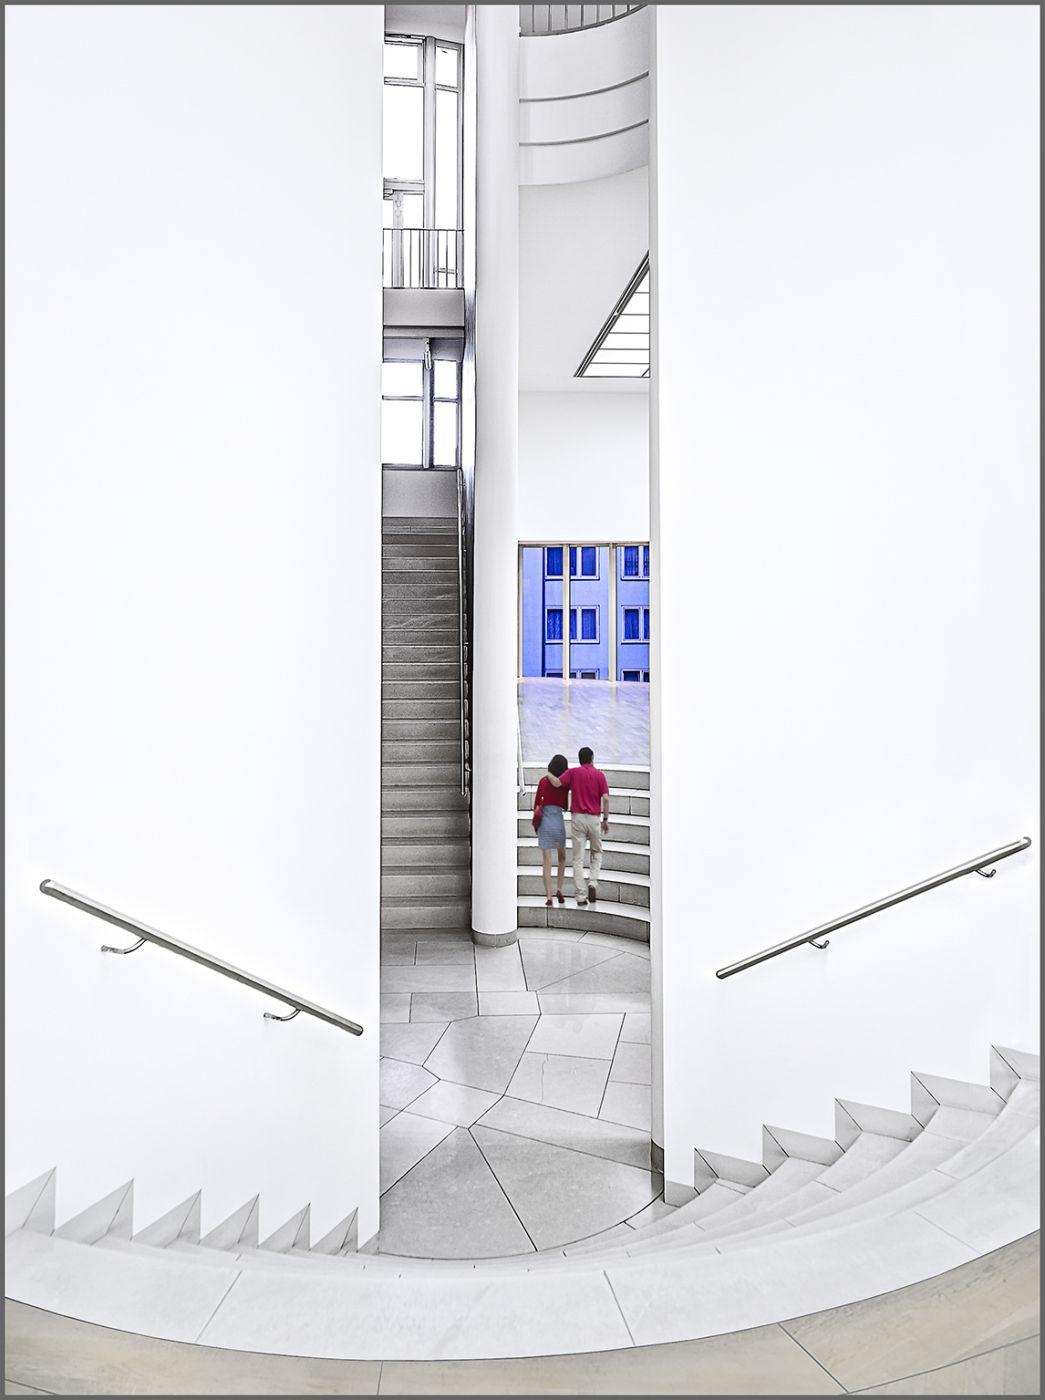 In the Museum of Modern Art, Frankfurt, Germany